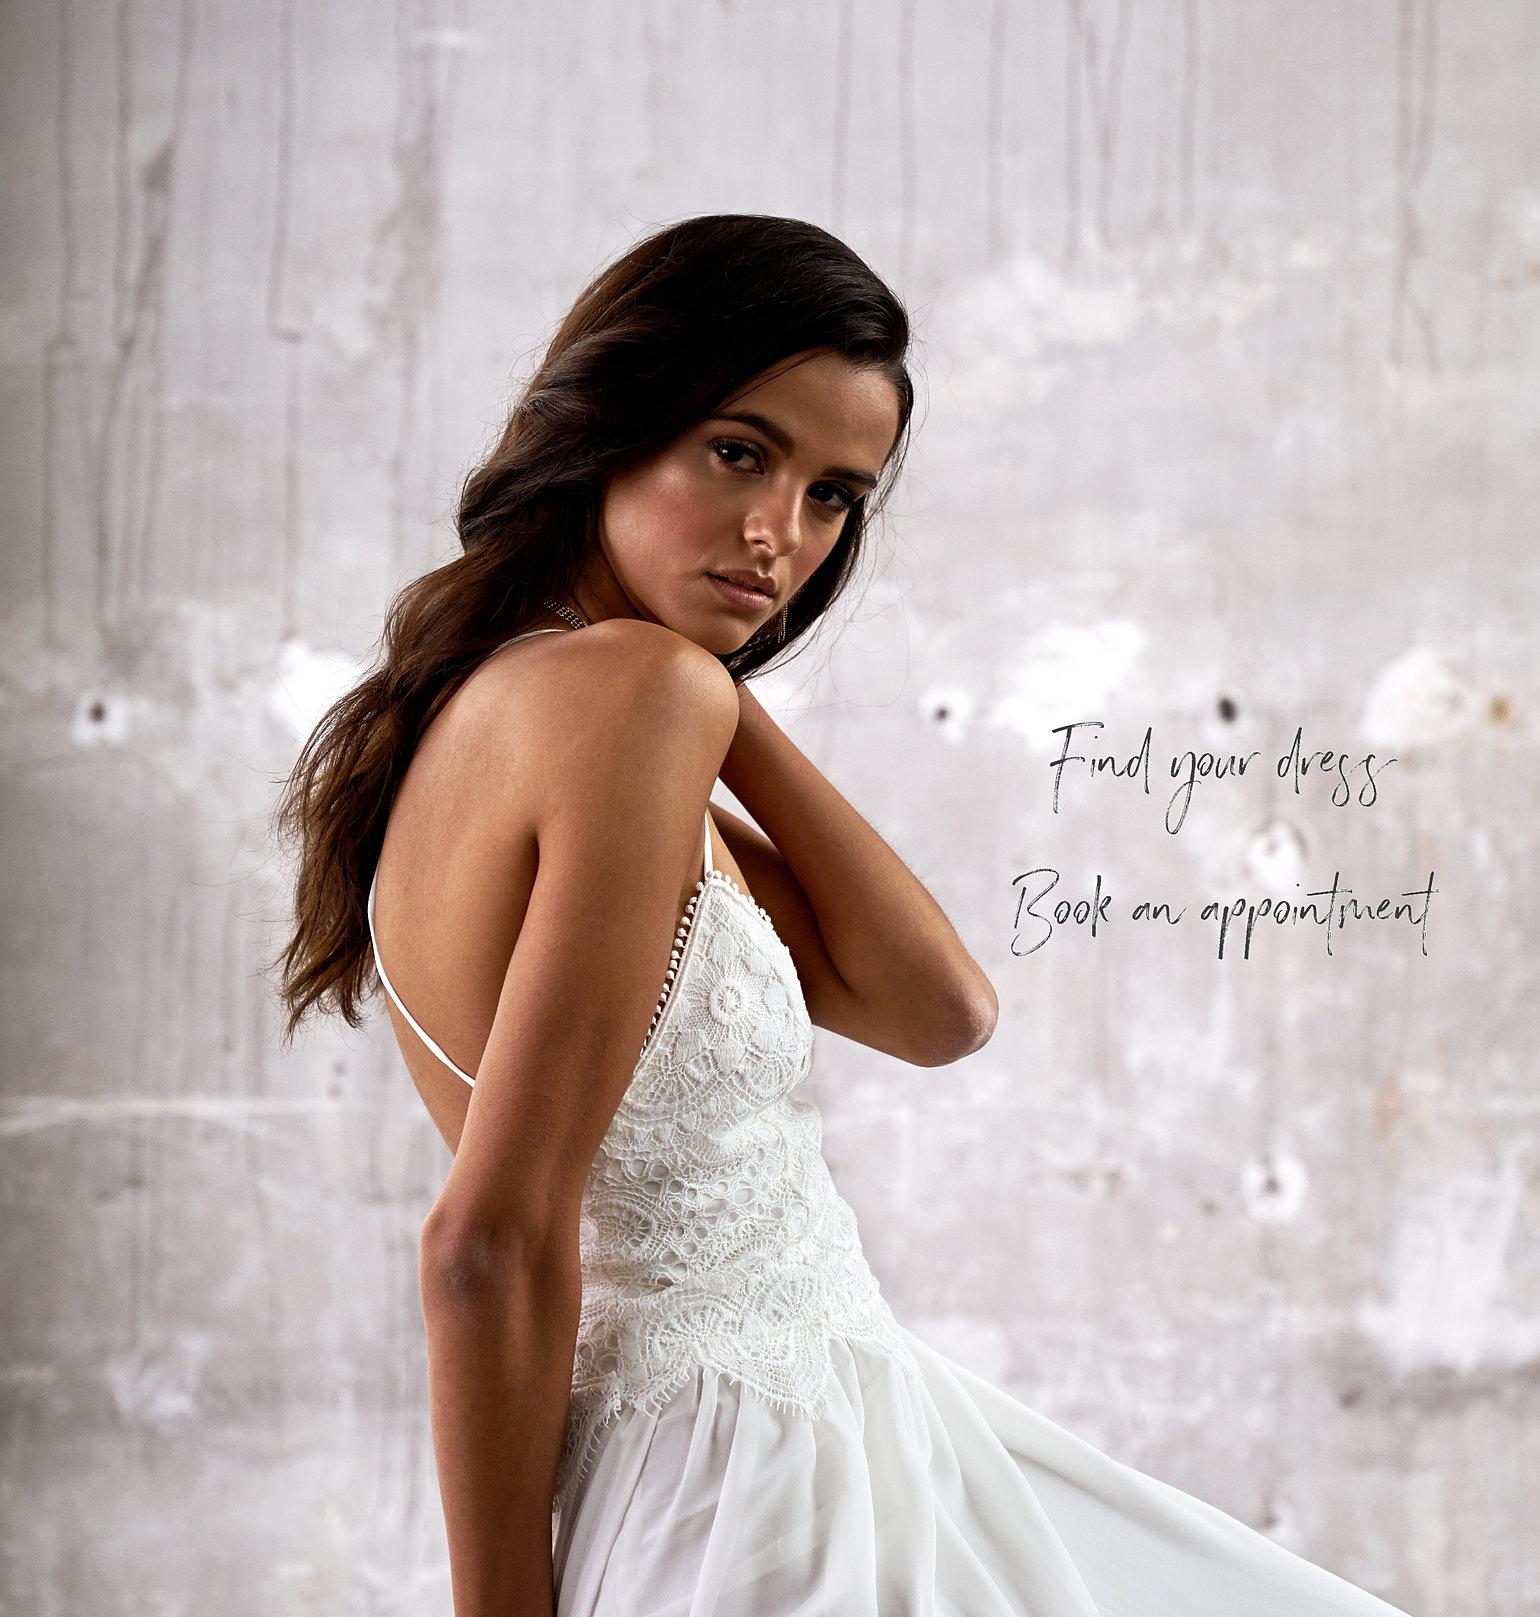 Brautkleider im modernen Boho Look | Mannheim | kiligdress